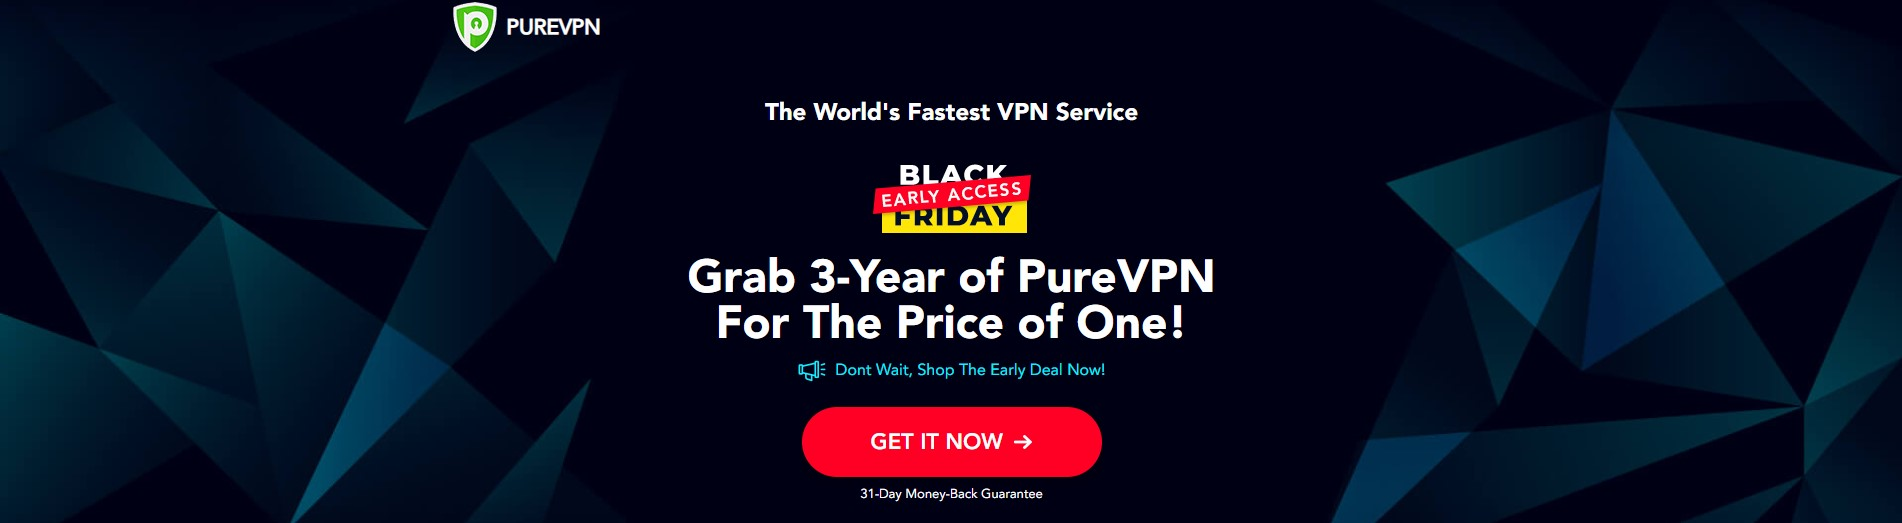 PureVPN Black Friday Cyber Monday deal